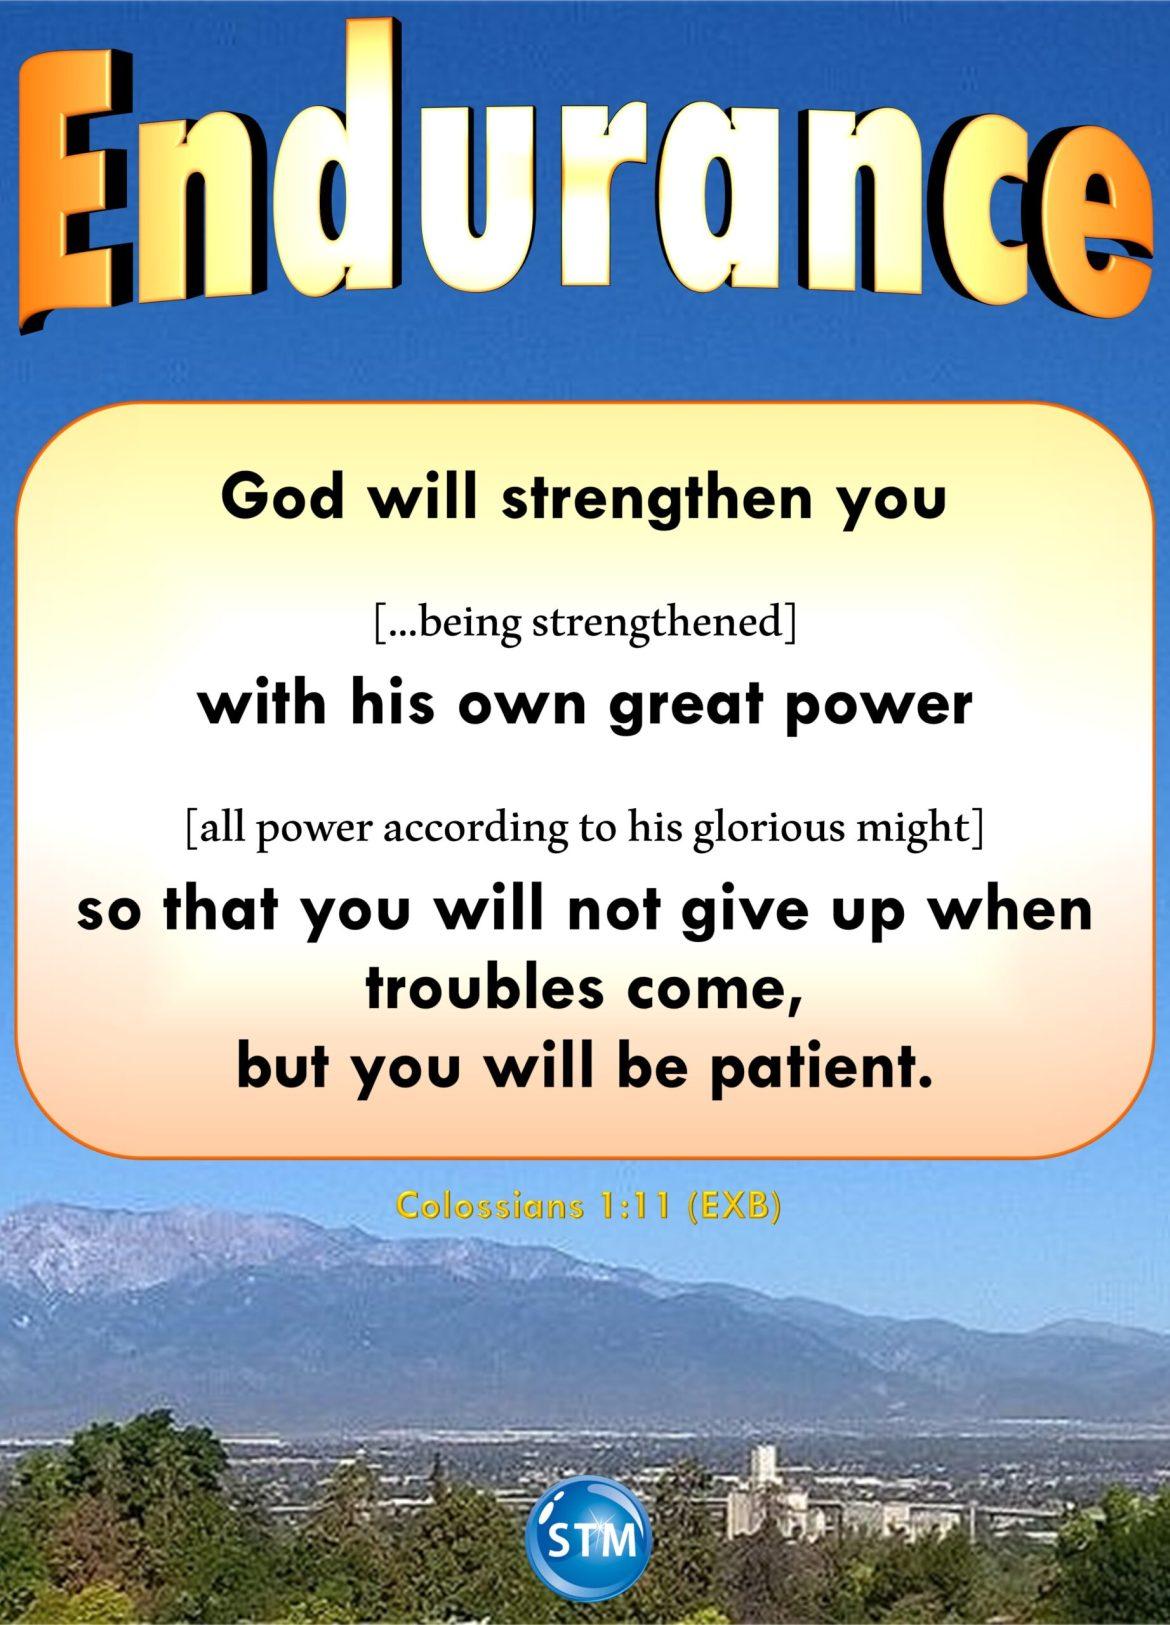 Endurance – You Can Go Through Whatever You Are Going Through